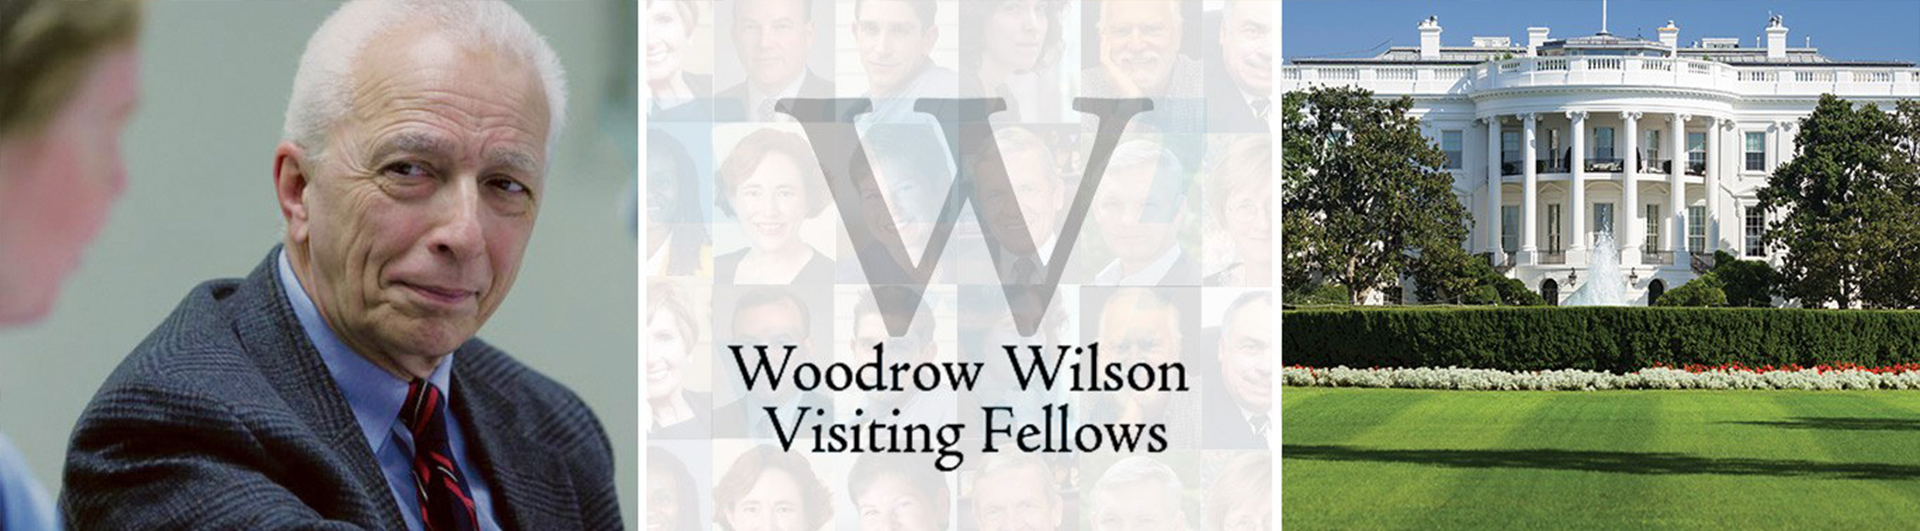 Woodrow Wilson Visiting Fellow Richard Benedetto.